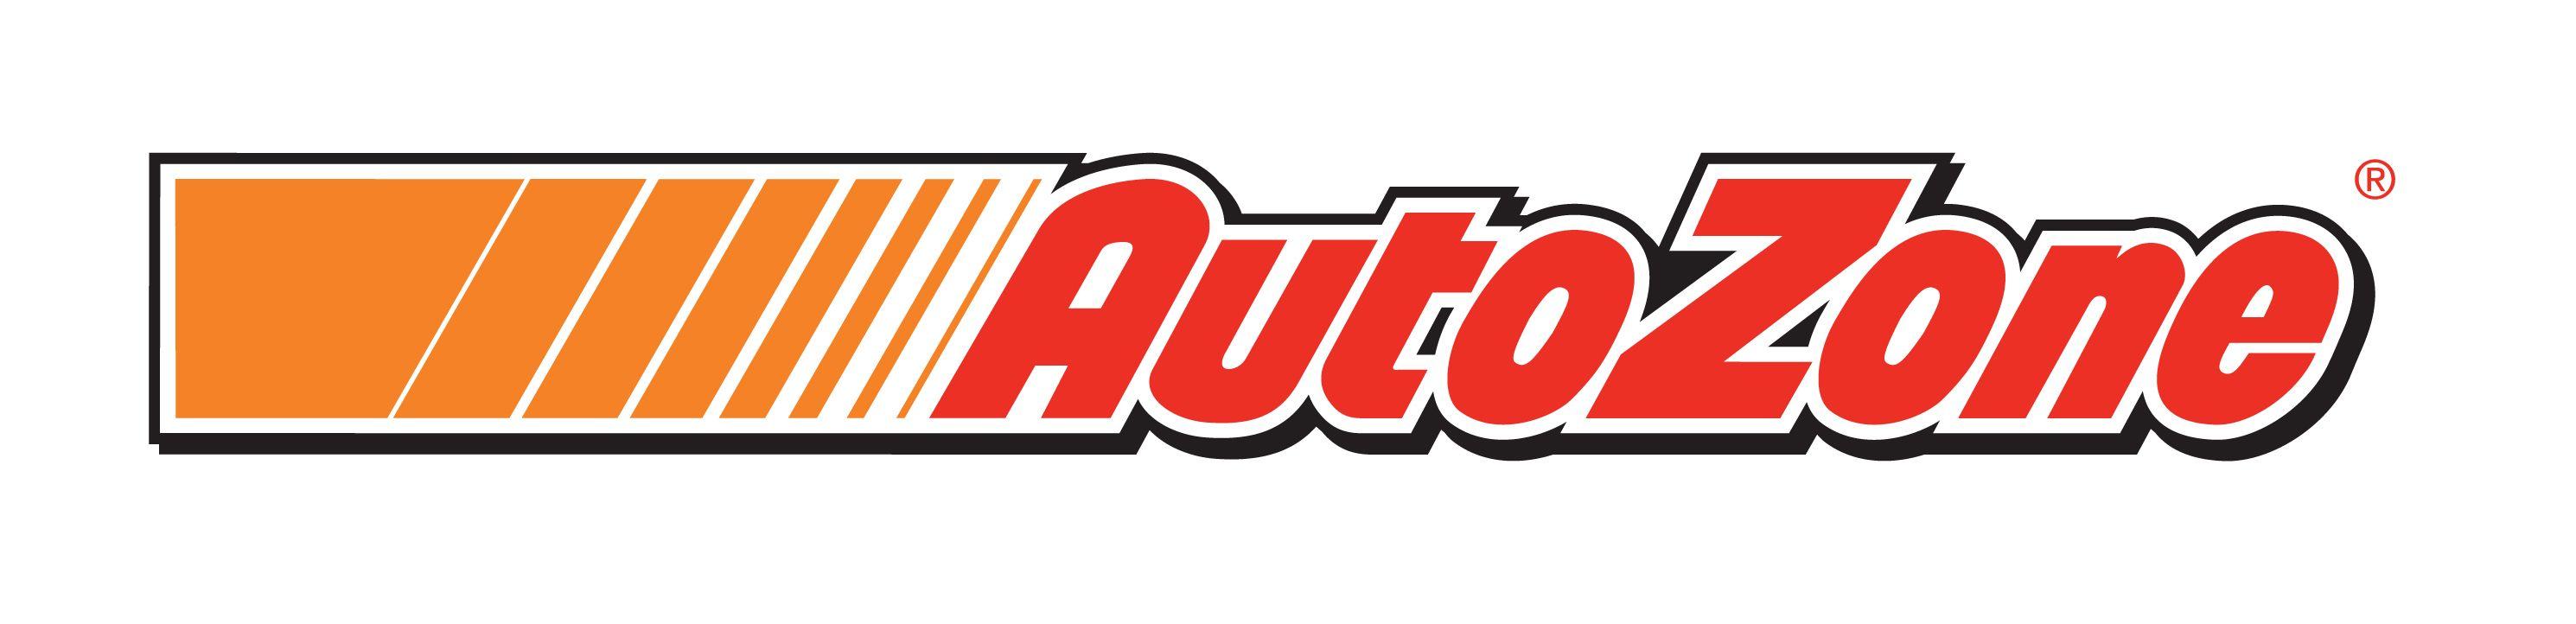 AutoZone logo Graphic Design Logos Online sales Coupons 2980x722